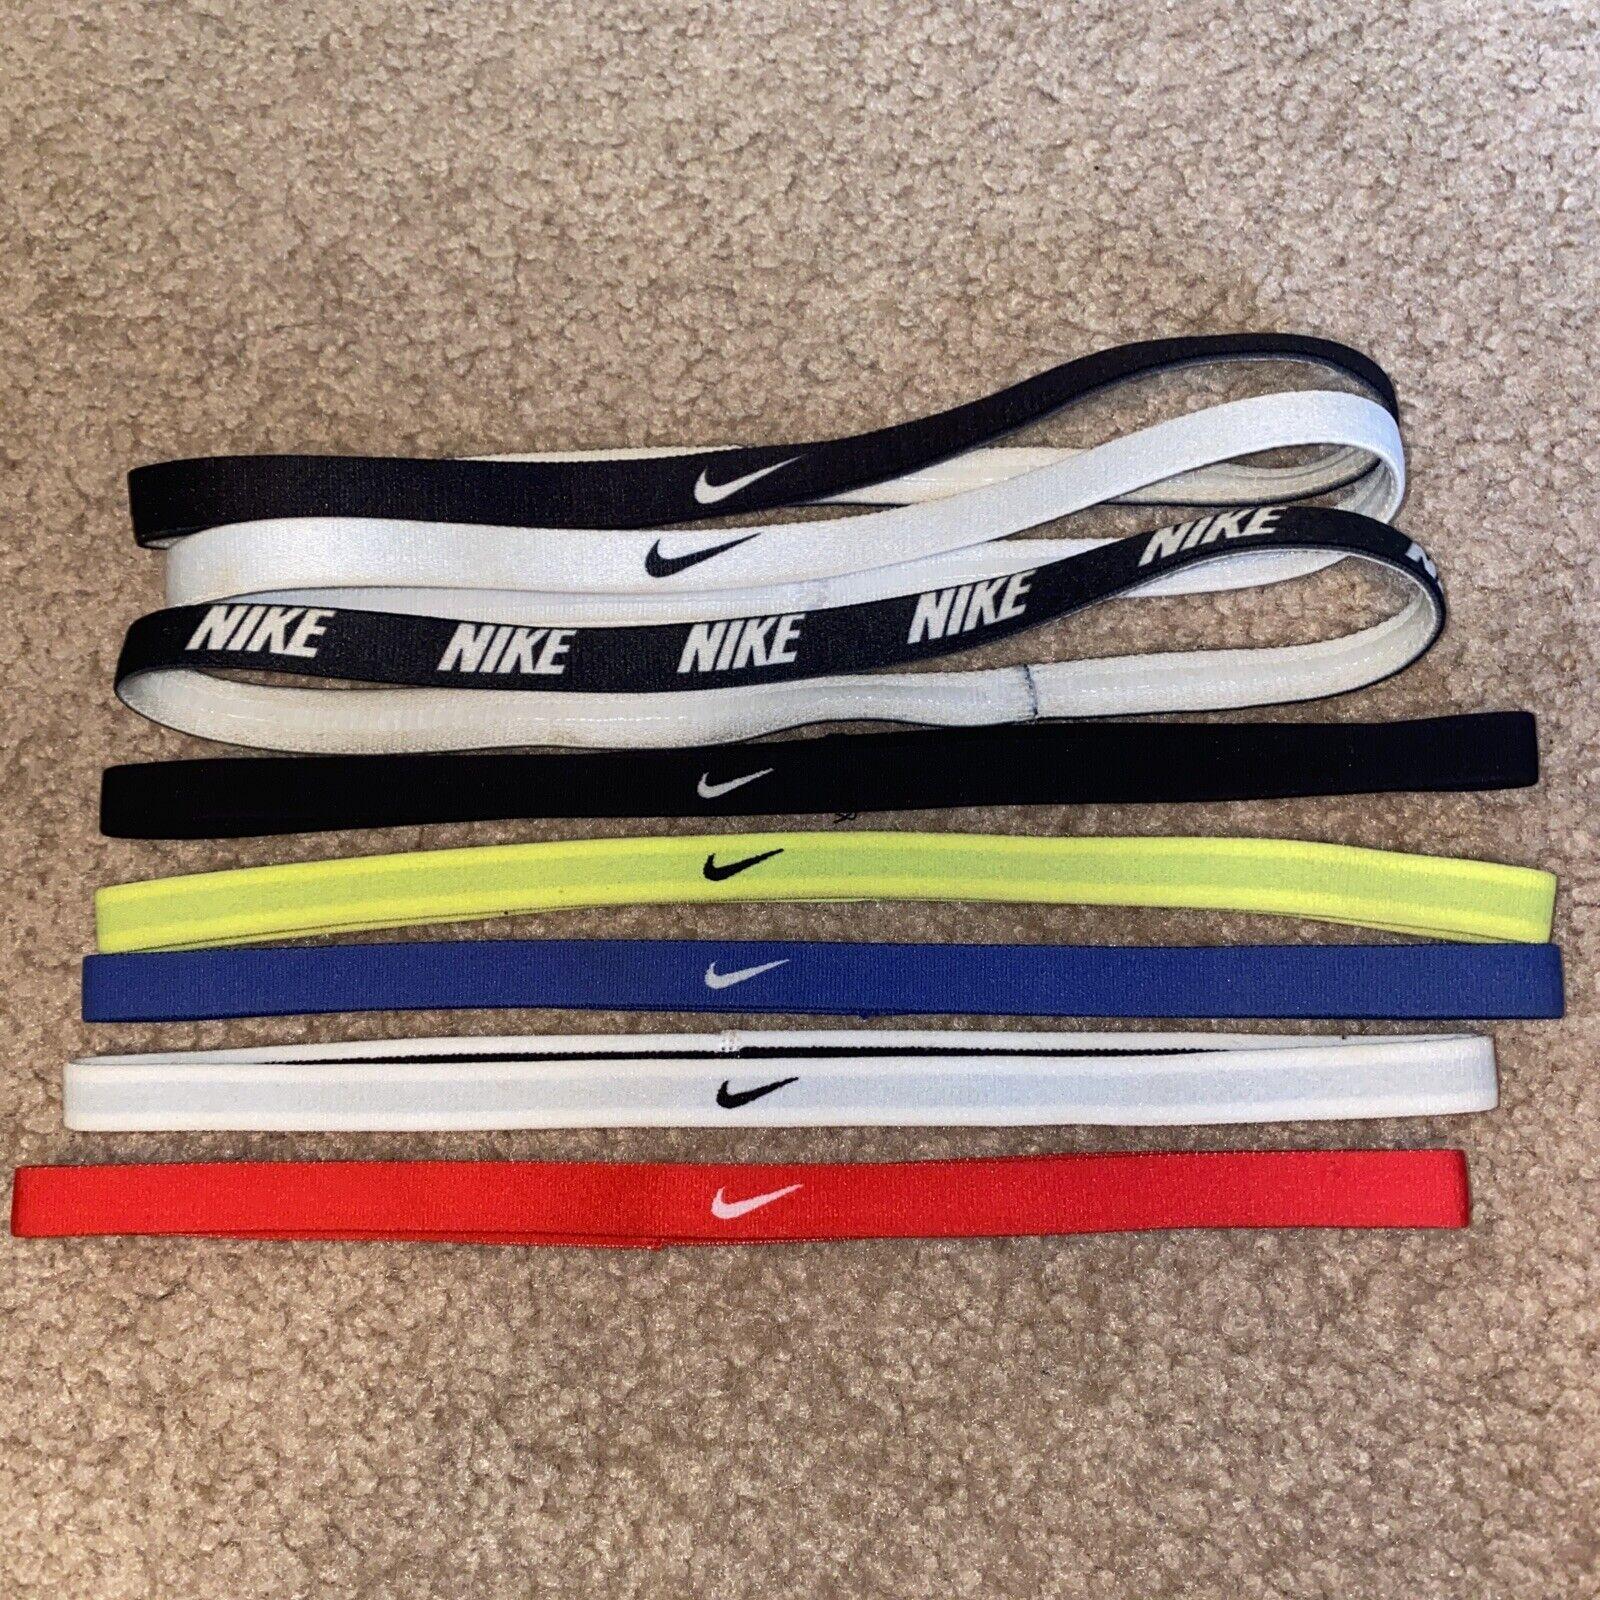 NIKE Headbands 8x Lot Bundle Red, White, Blue, Neon, Black Set Headband